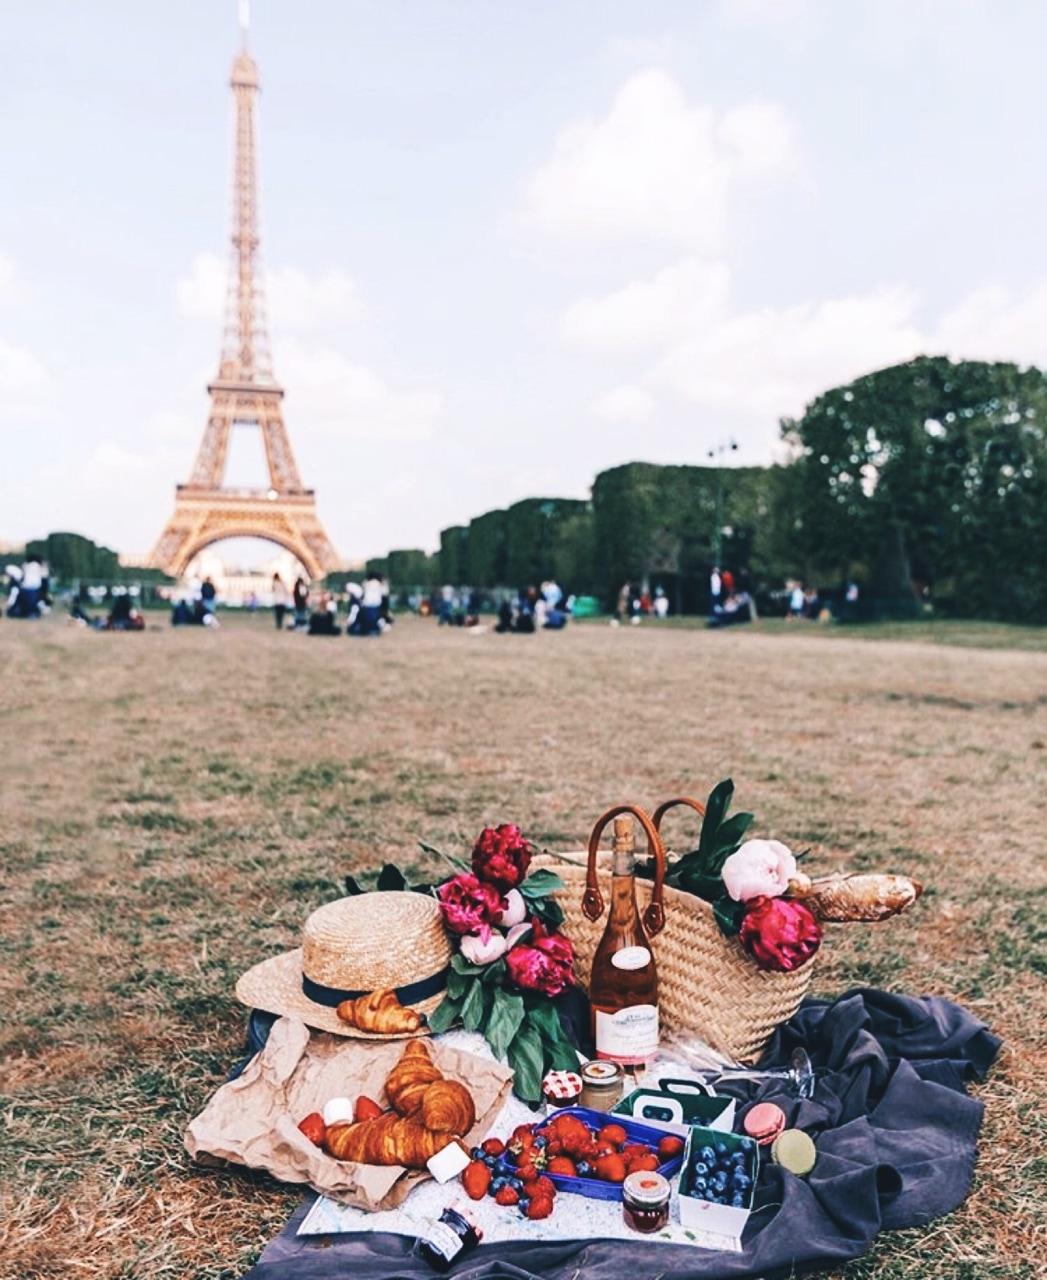 paris and picnic image